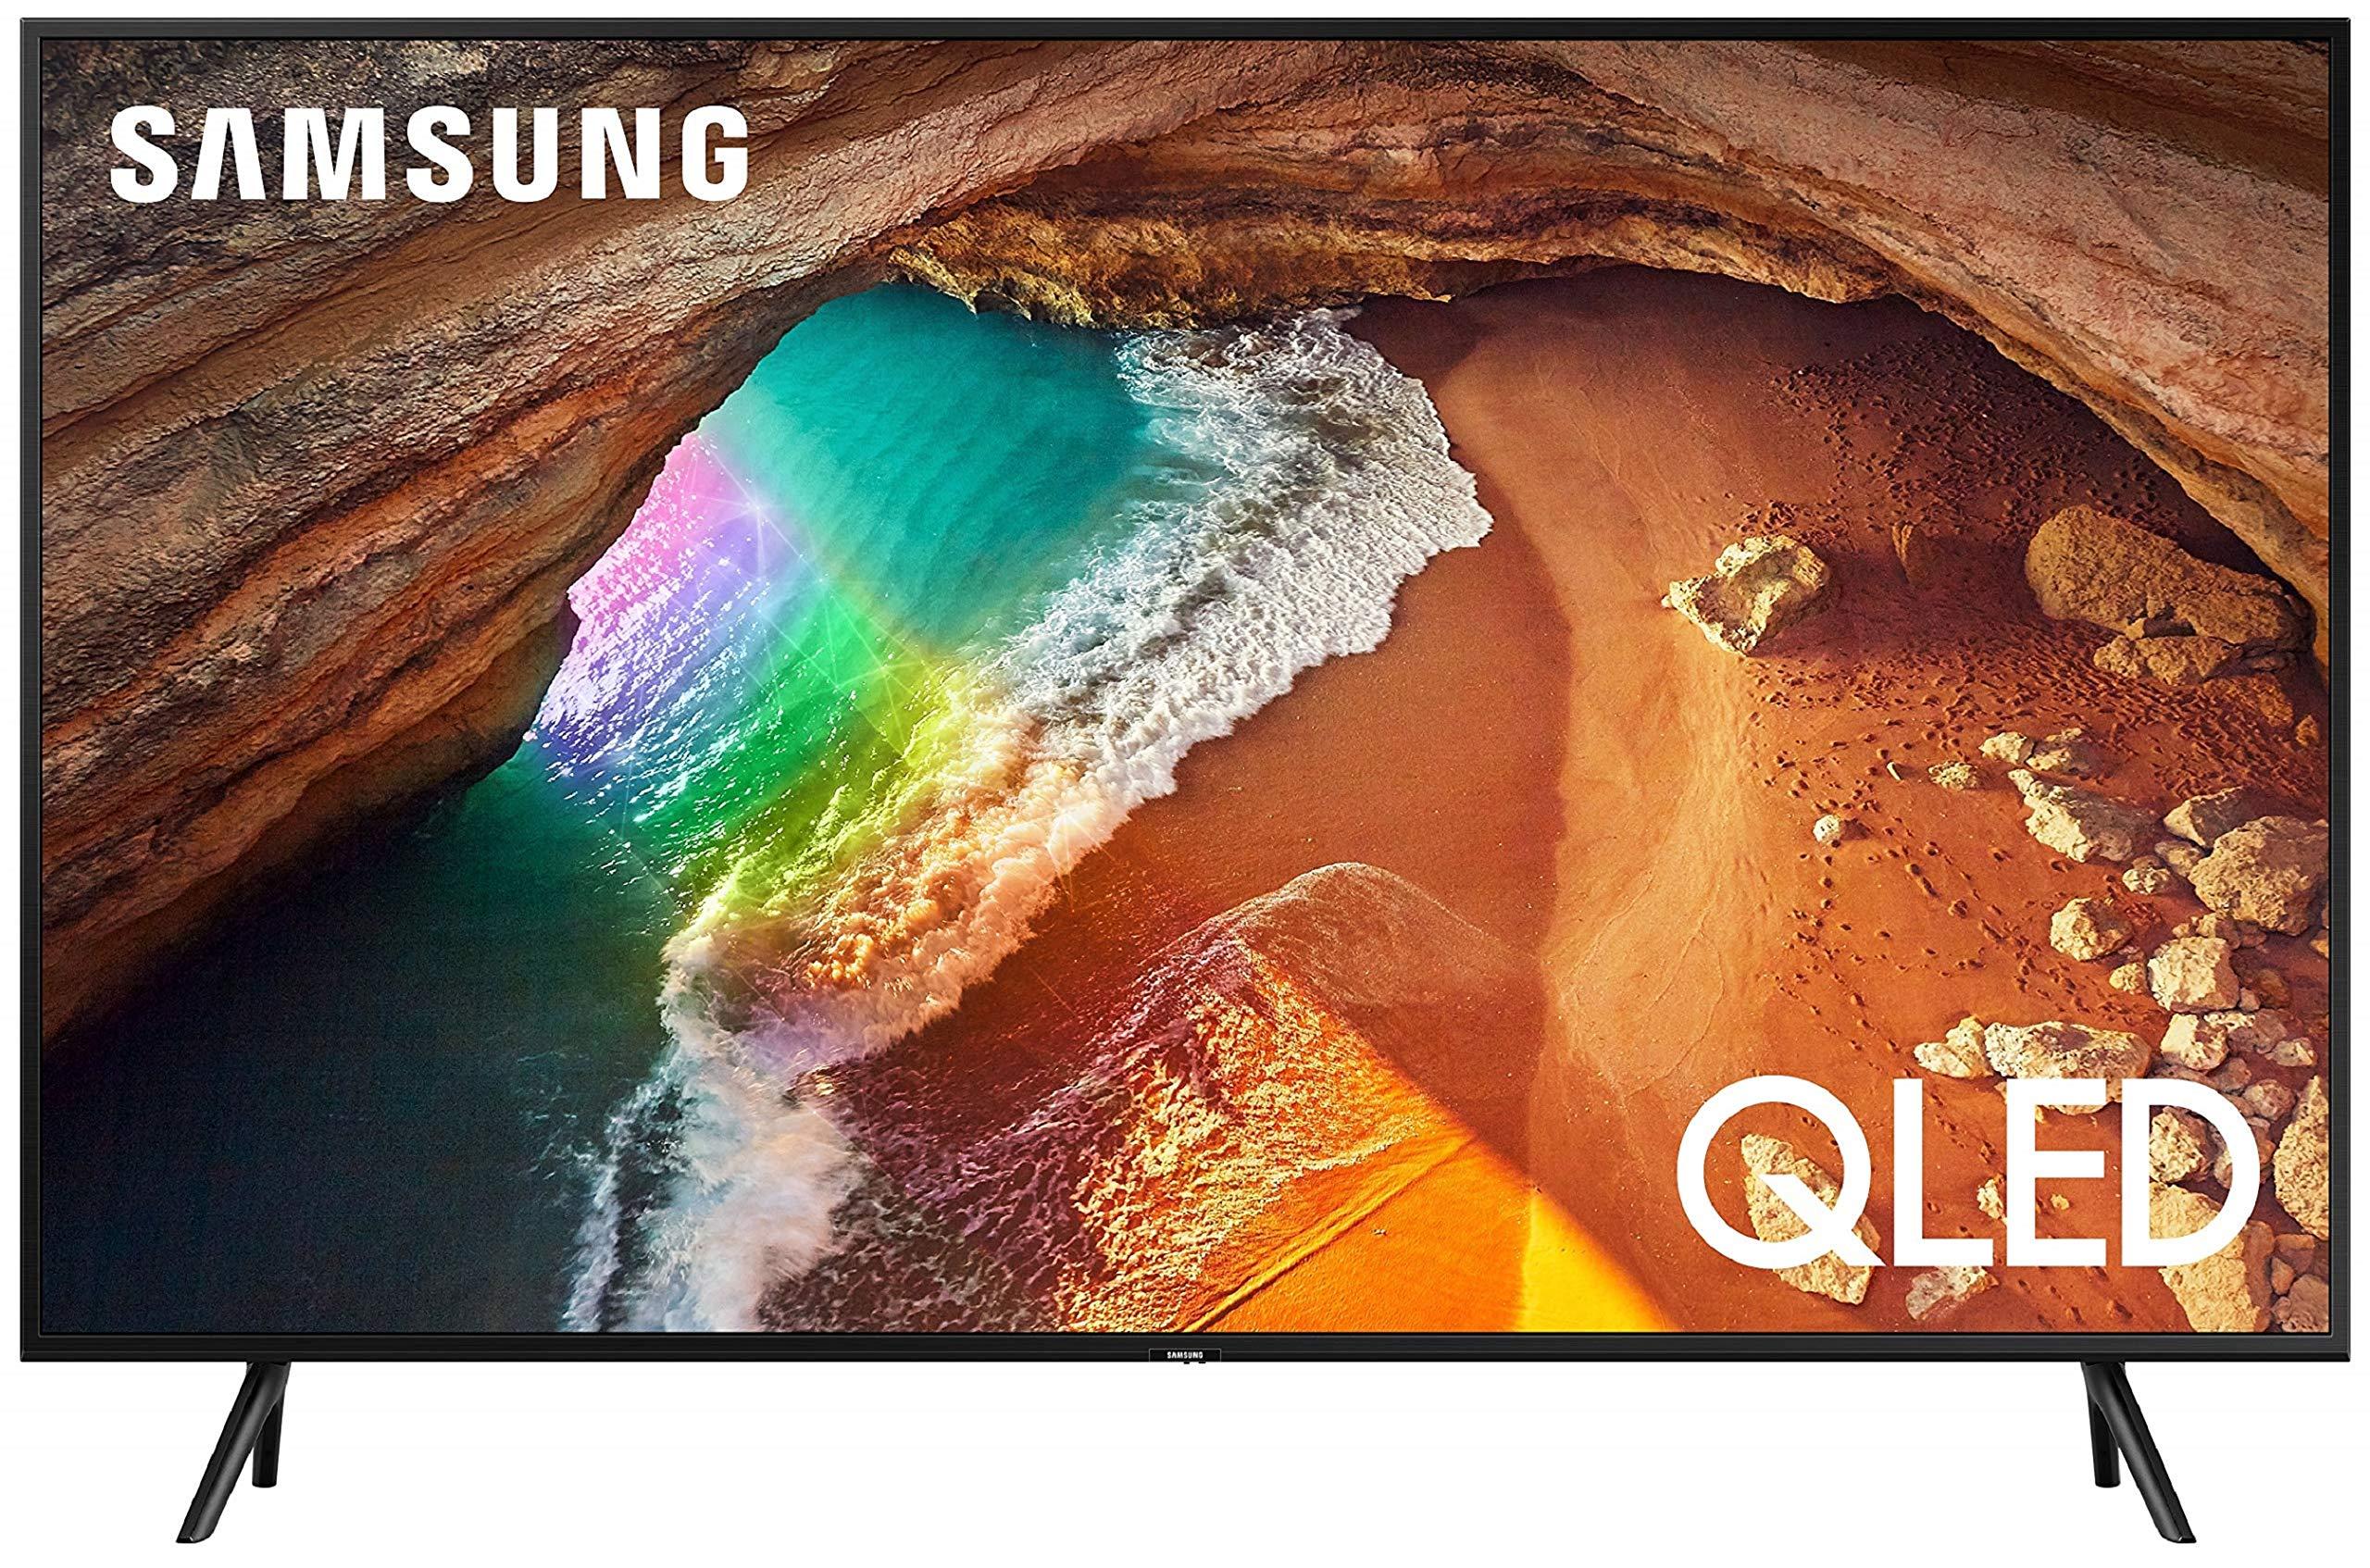 Samsung 108 cm (43 Inches) 4K Ultra HD Smart QLED TV QA43Q60RAKXXL (Black) (2019 Model)